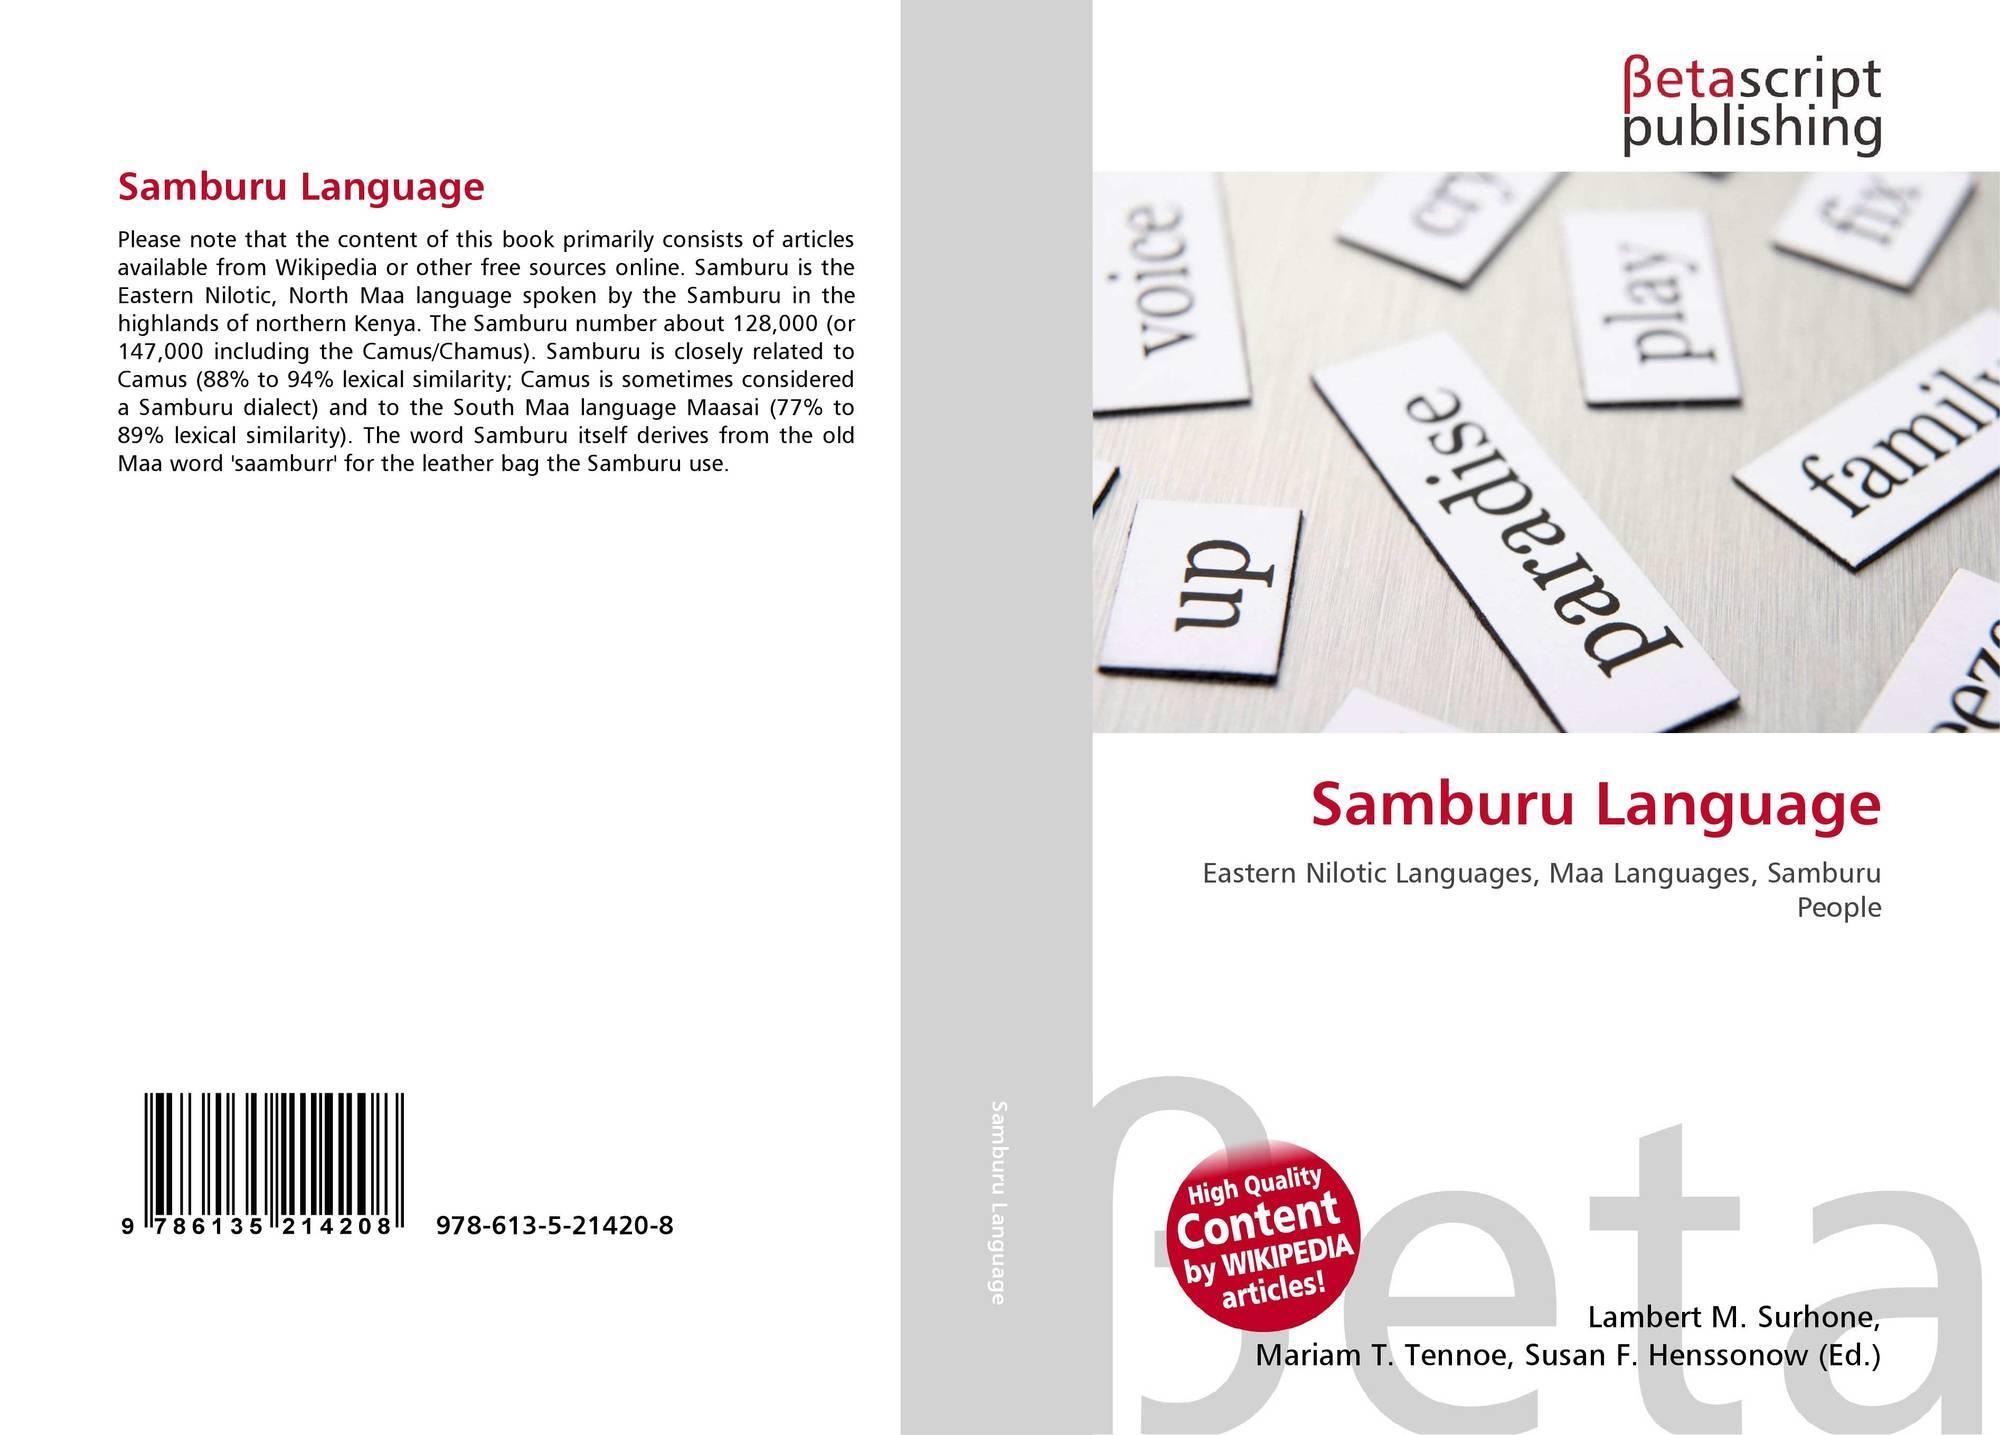 samburu language 9786135214208 6135214209 9786135214208